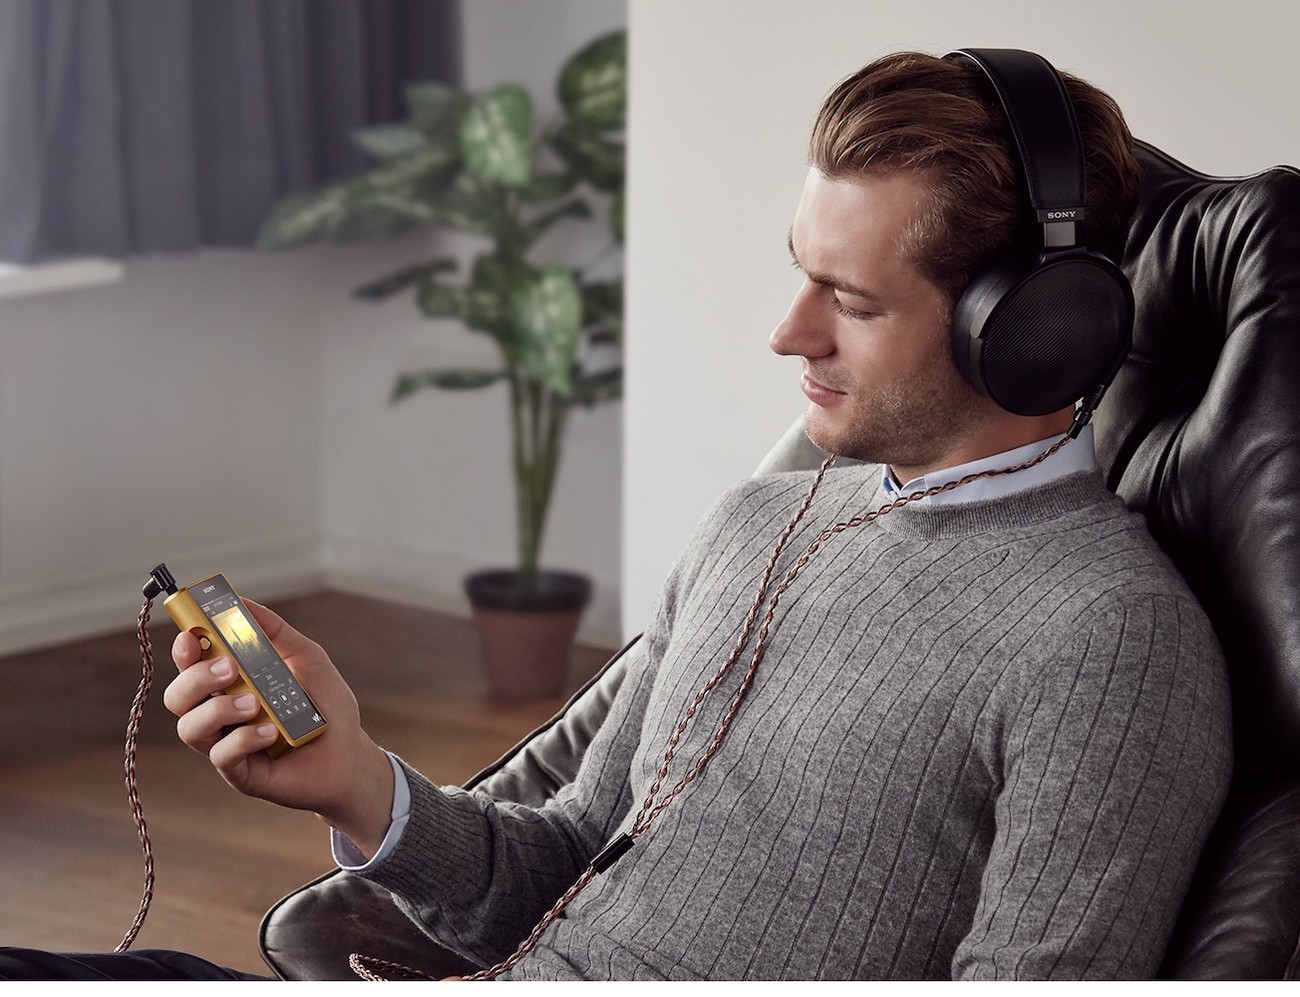 Sony Premium Walkman with High-Resolution Audio